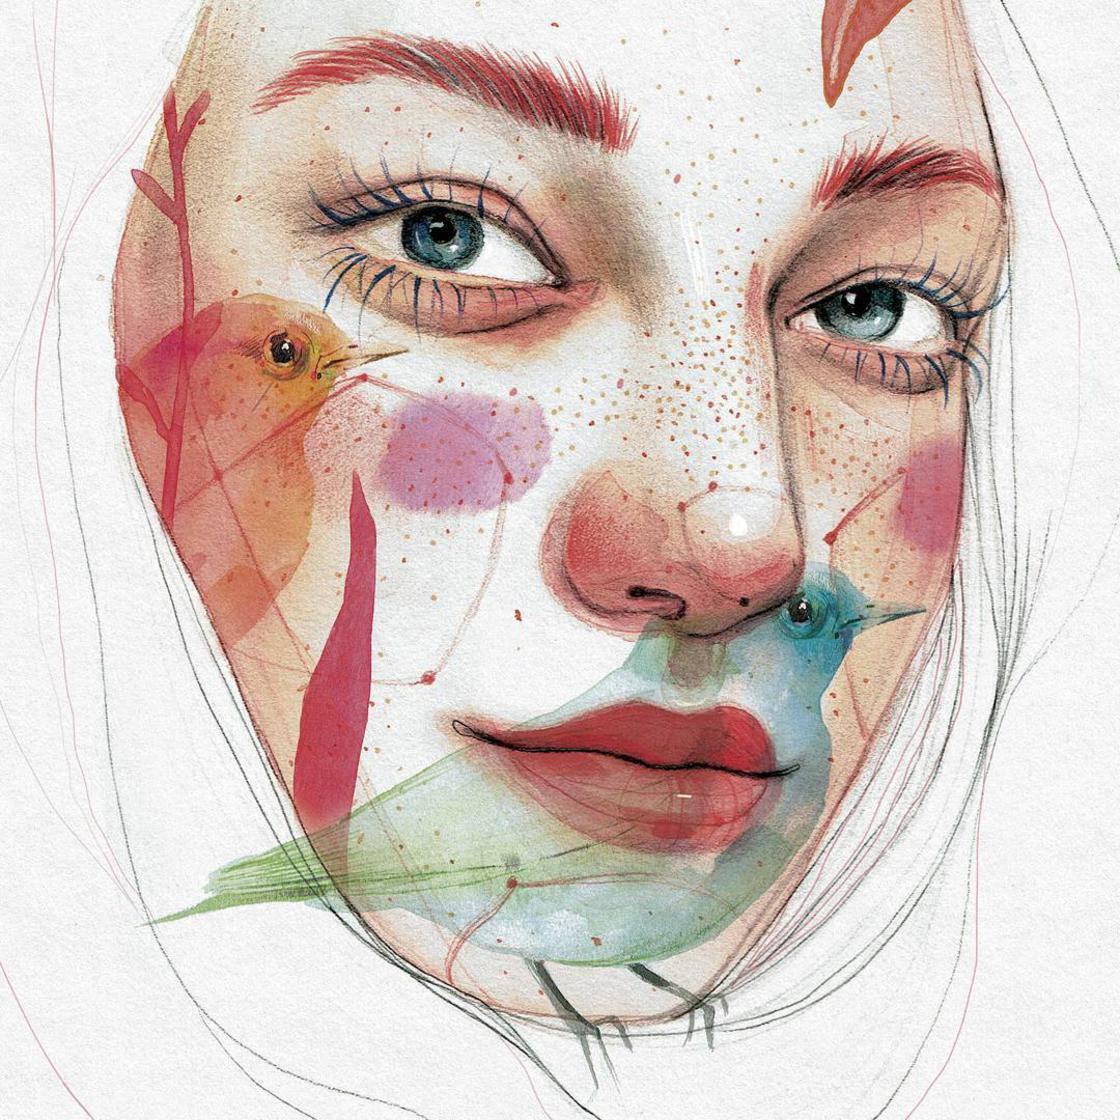 ana-santos-girl-portraits-20.jpg